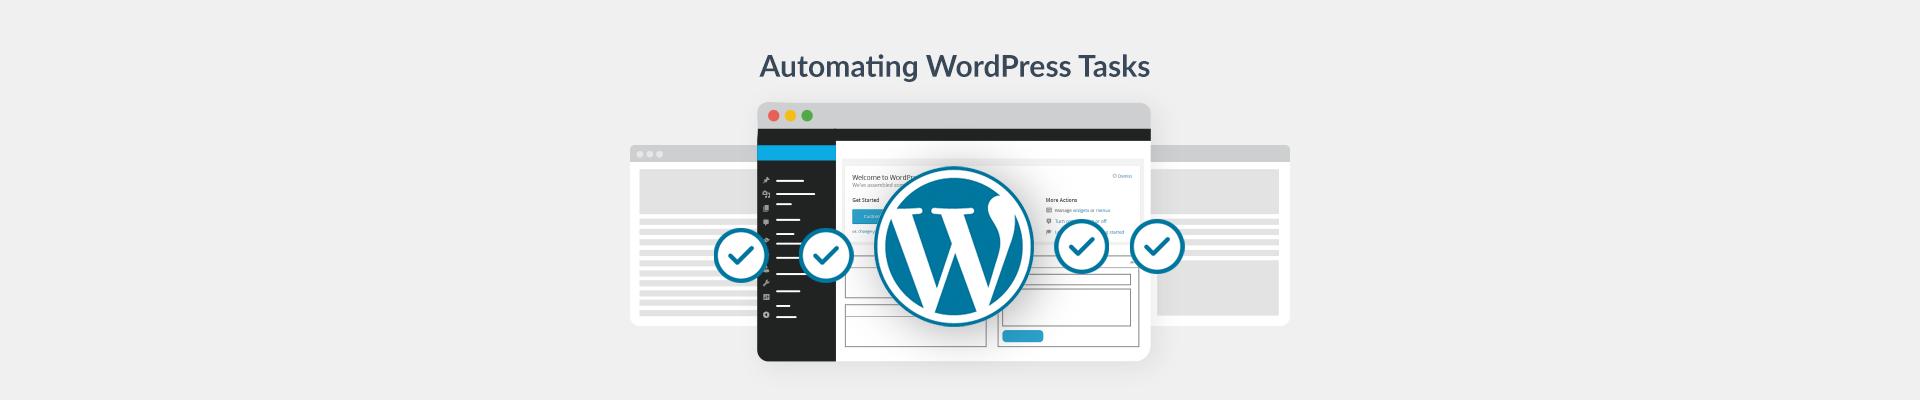 Automating WordPress Plesk blog